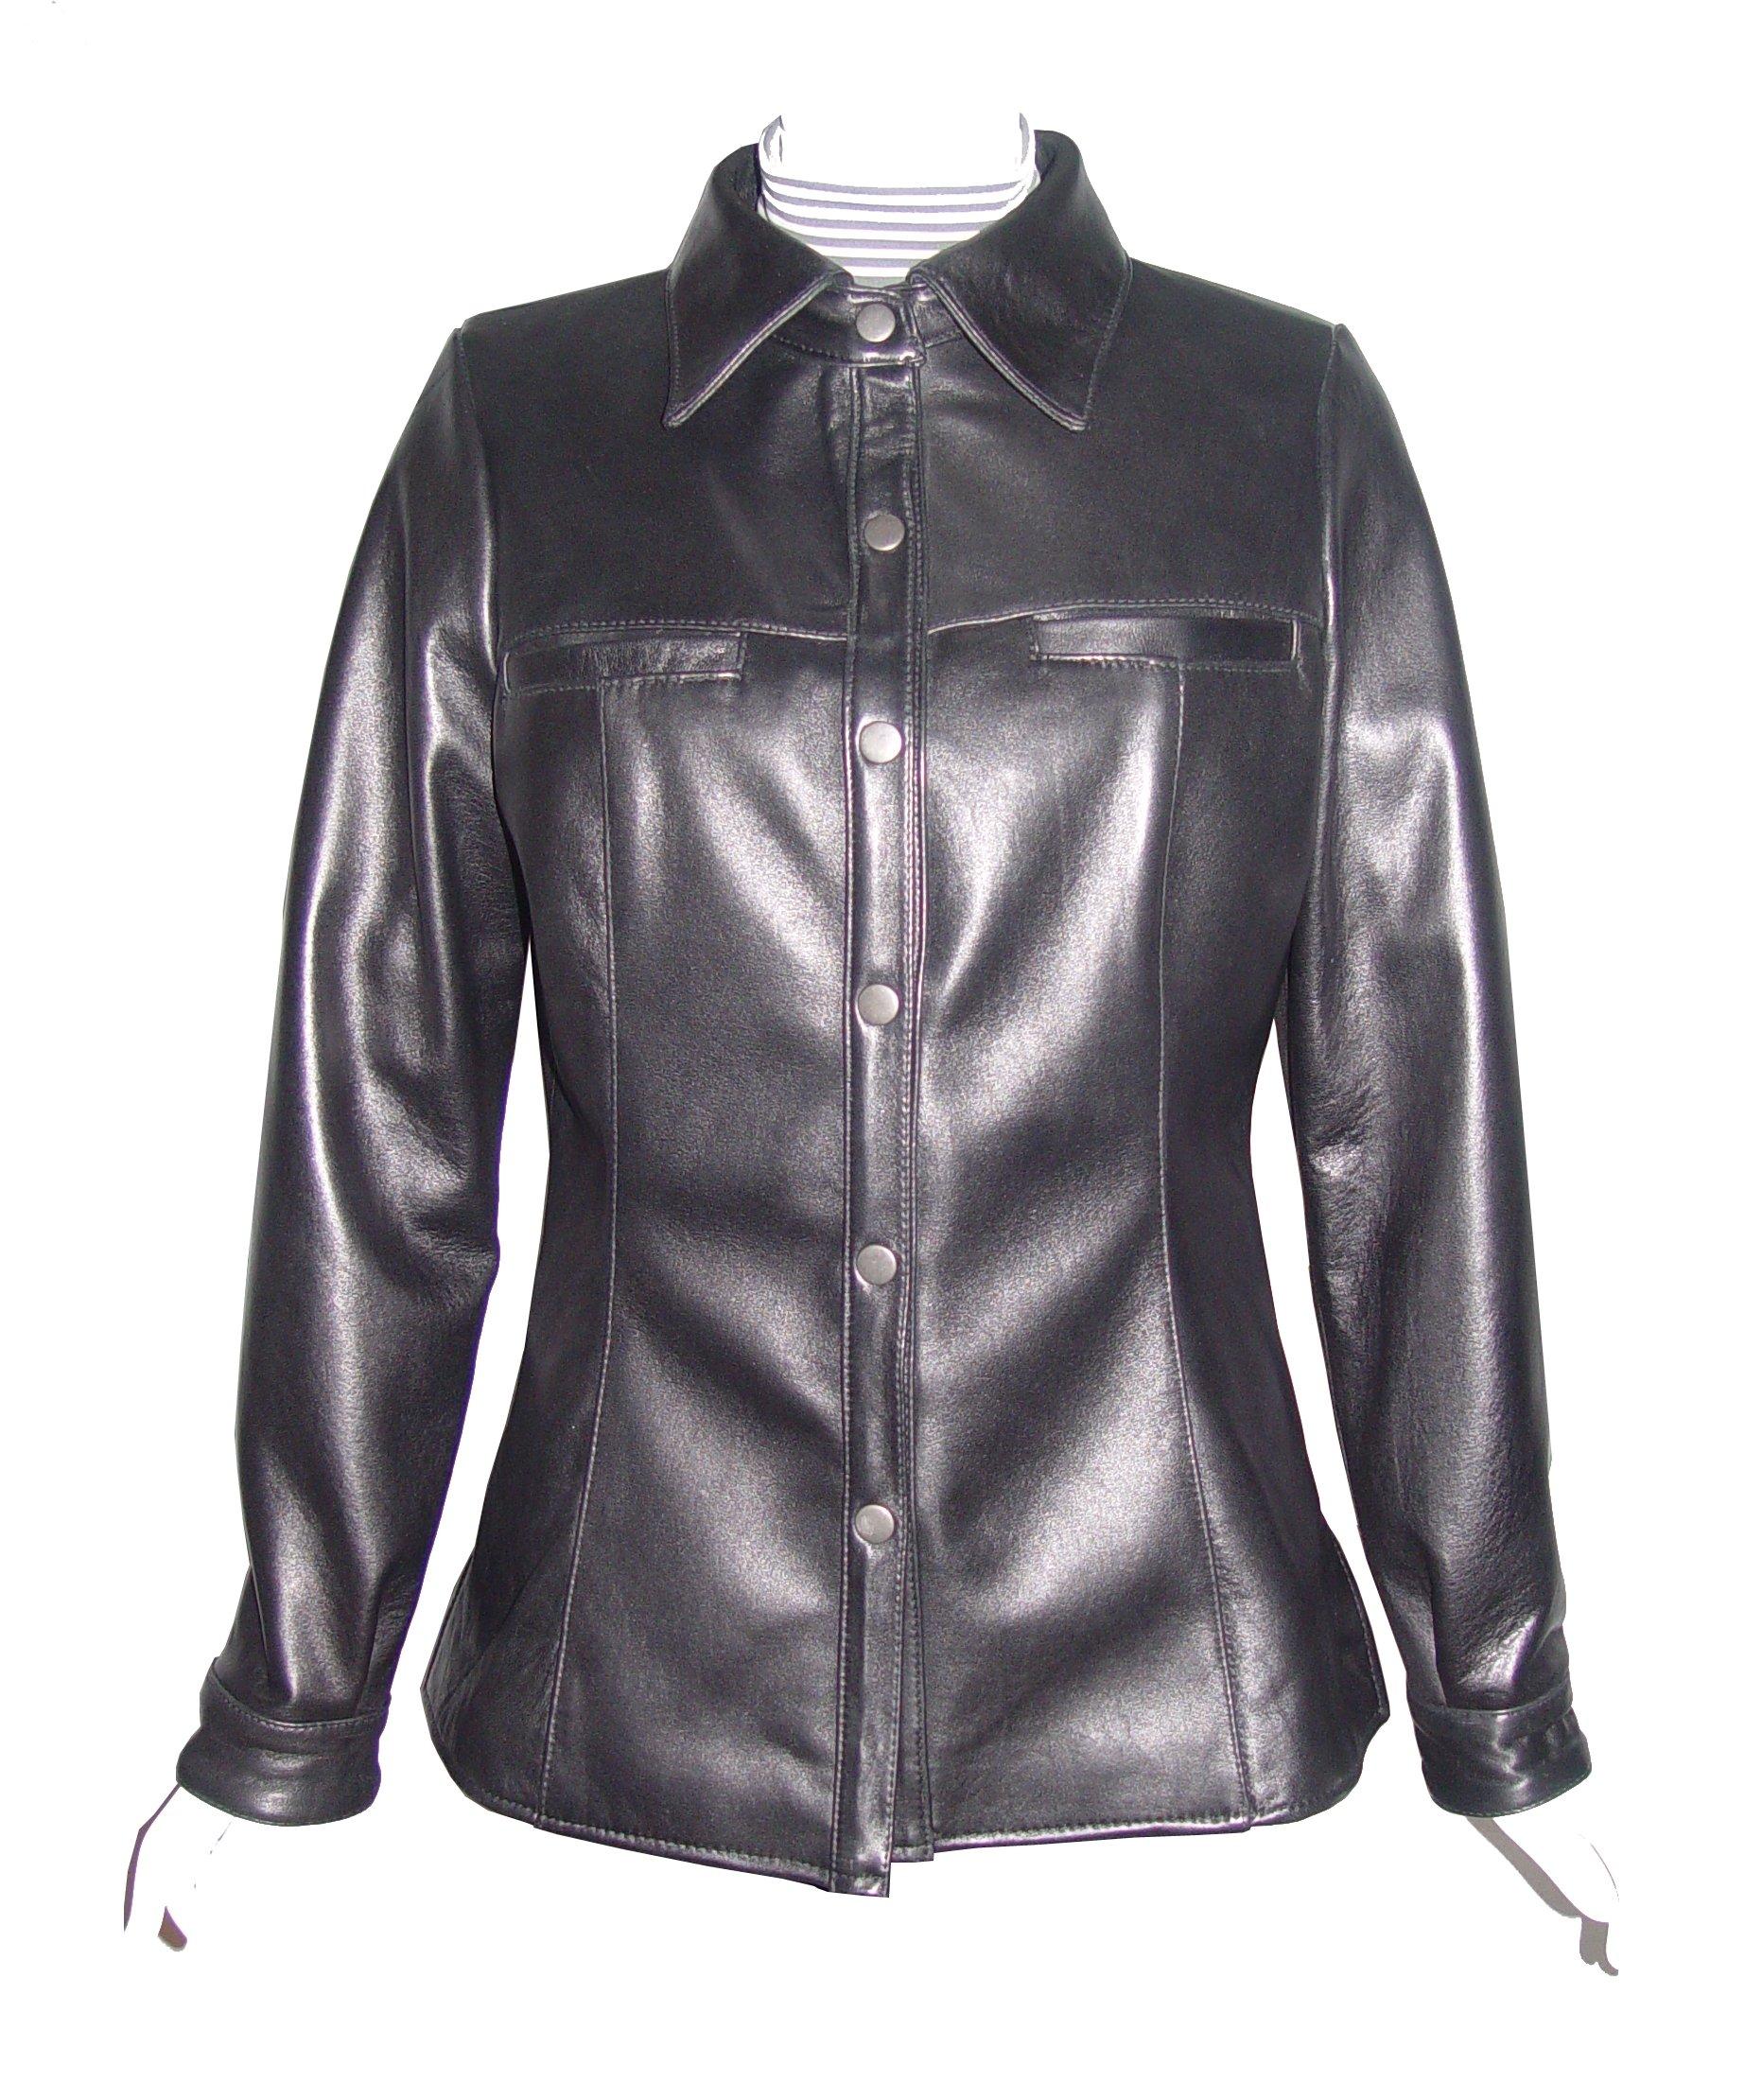 Nettailor 4081 Clean New Lambskin Genuine Leather Shirt Jacket Fine Soft Lamb